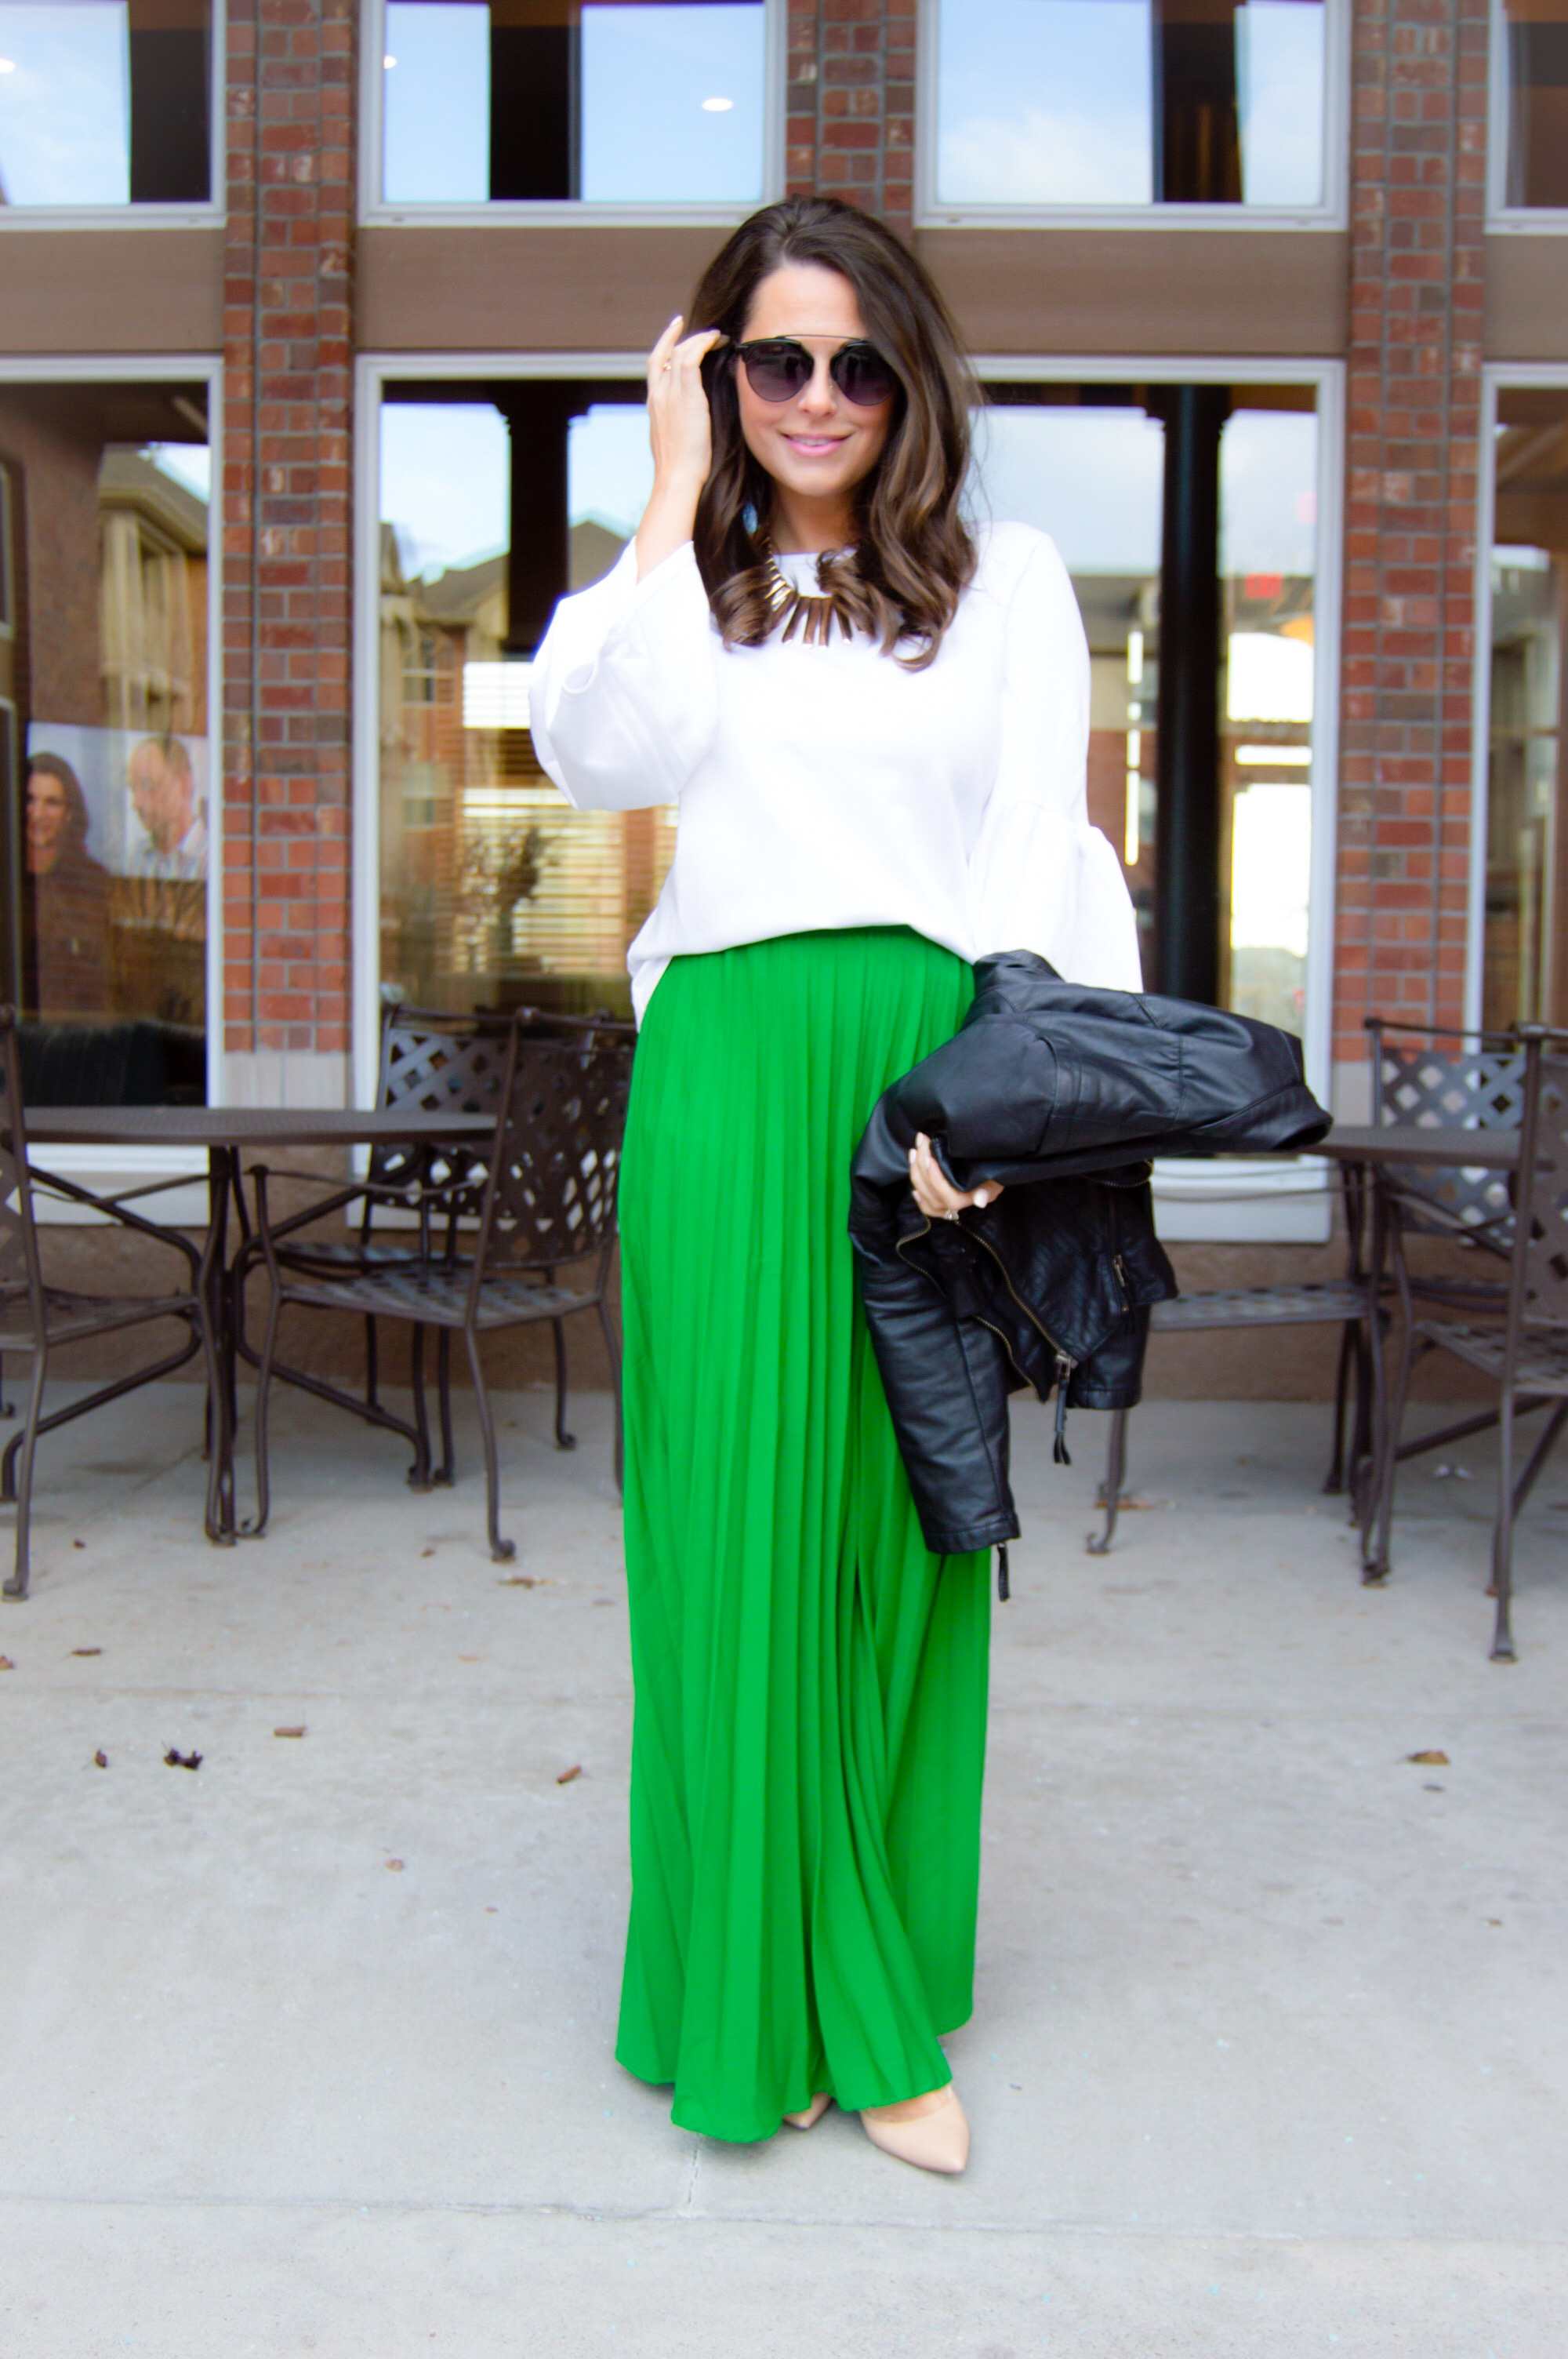 d69947630a Green Maxi Skirt White Top | Saddha